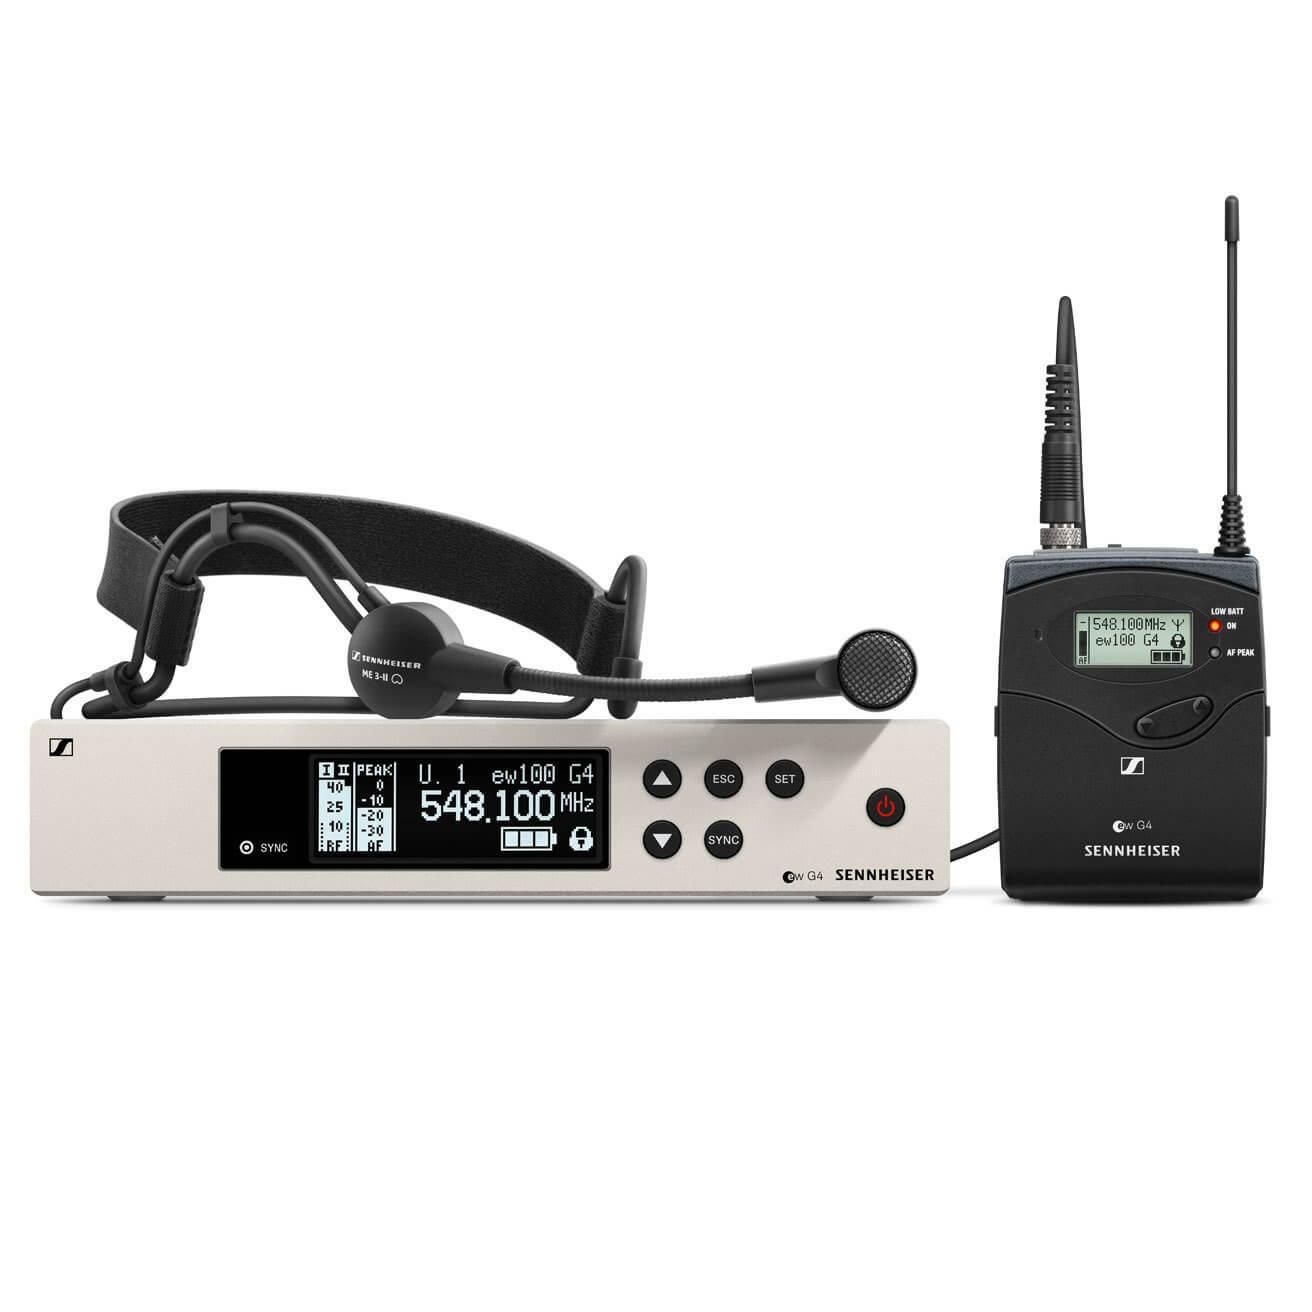 Afbeelding van Sennheiser ew 100 G4-ME3 draadloze headset (626-668 MHz)